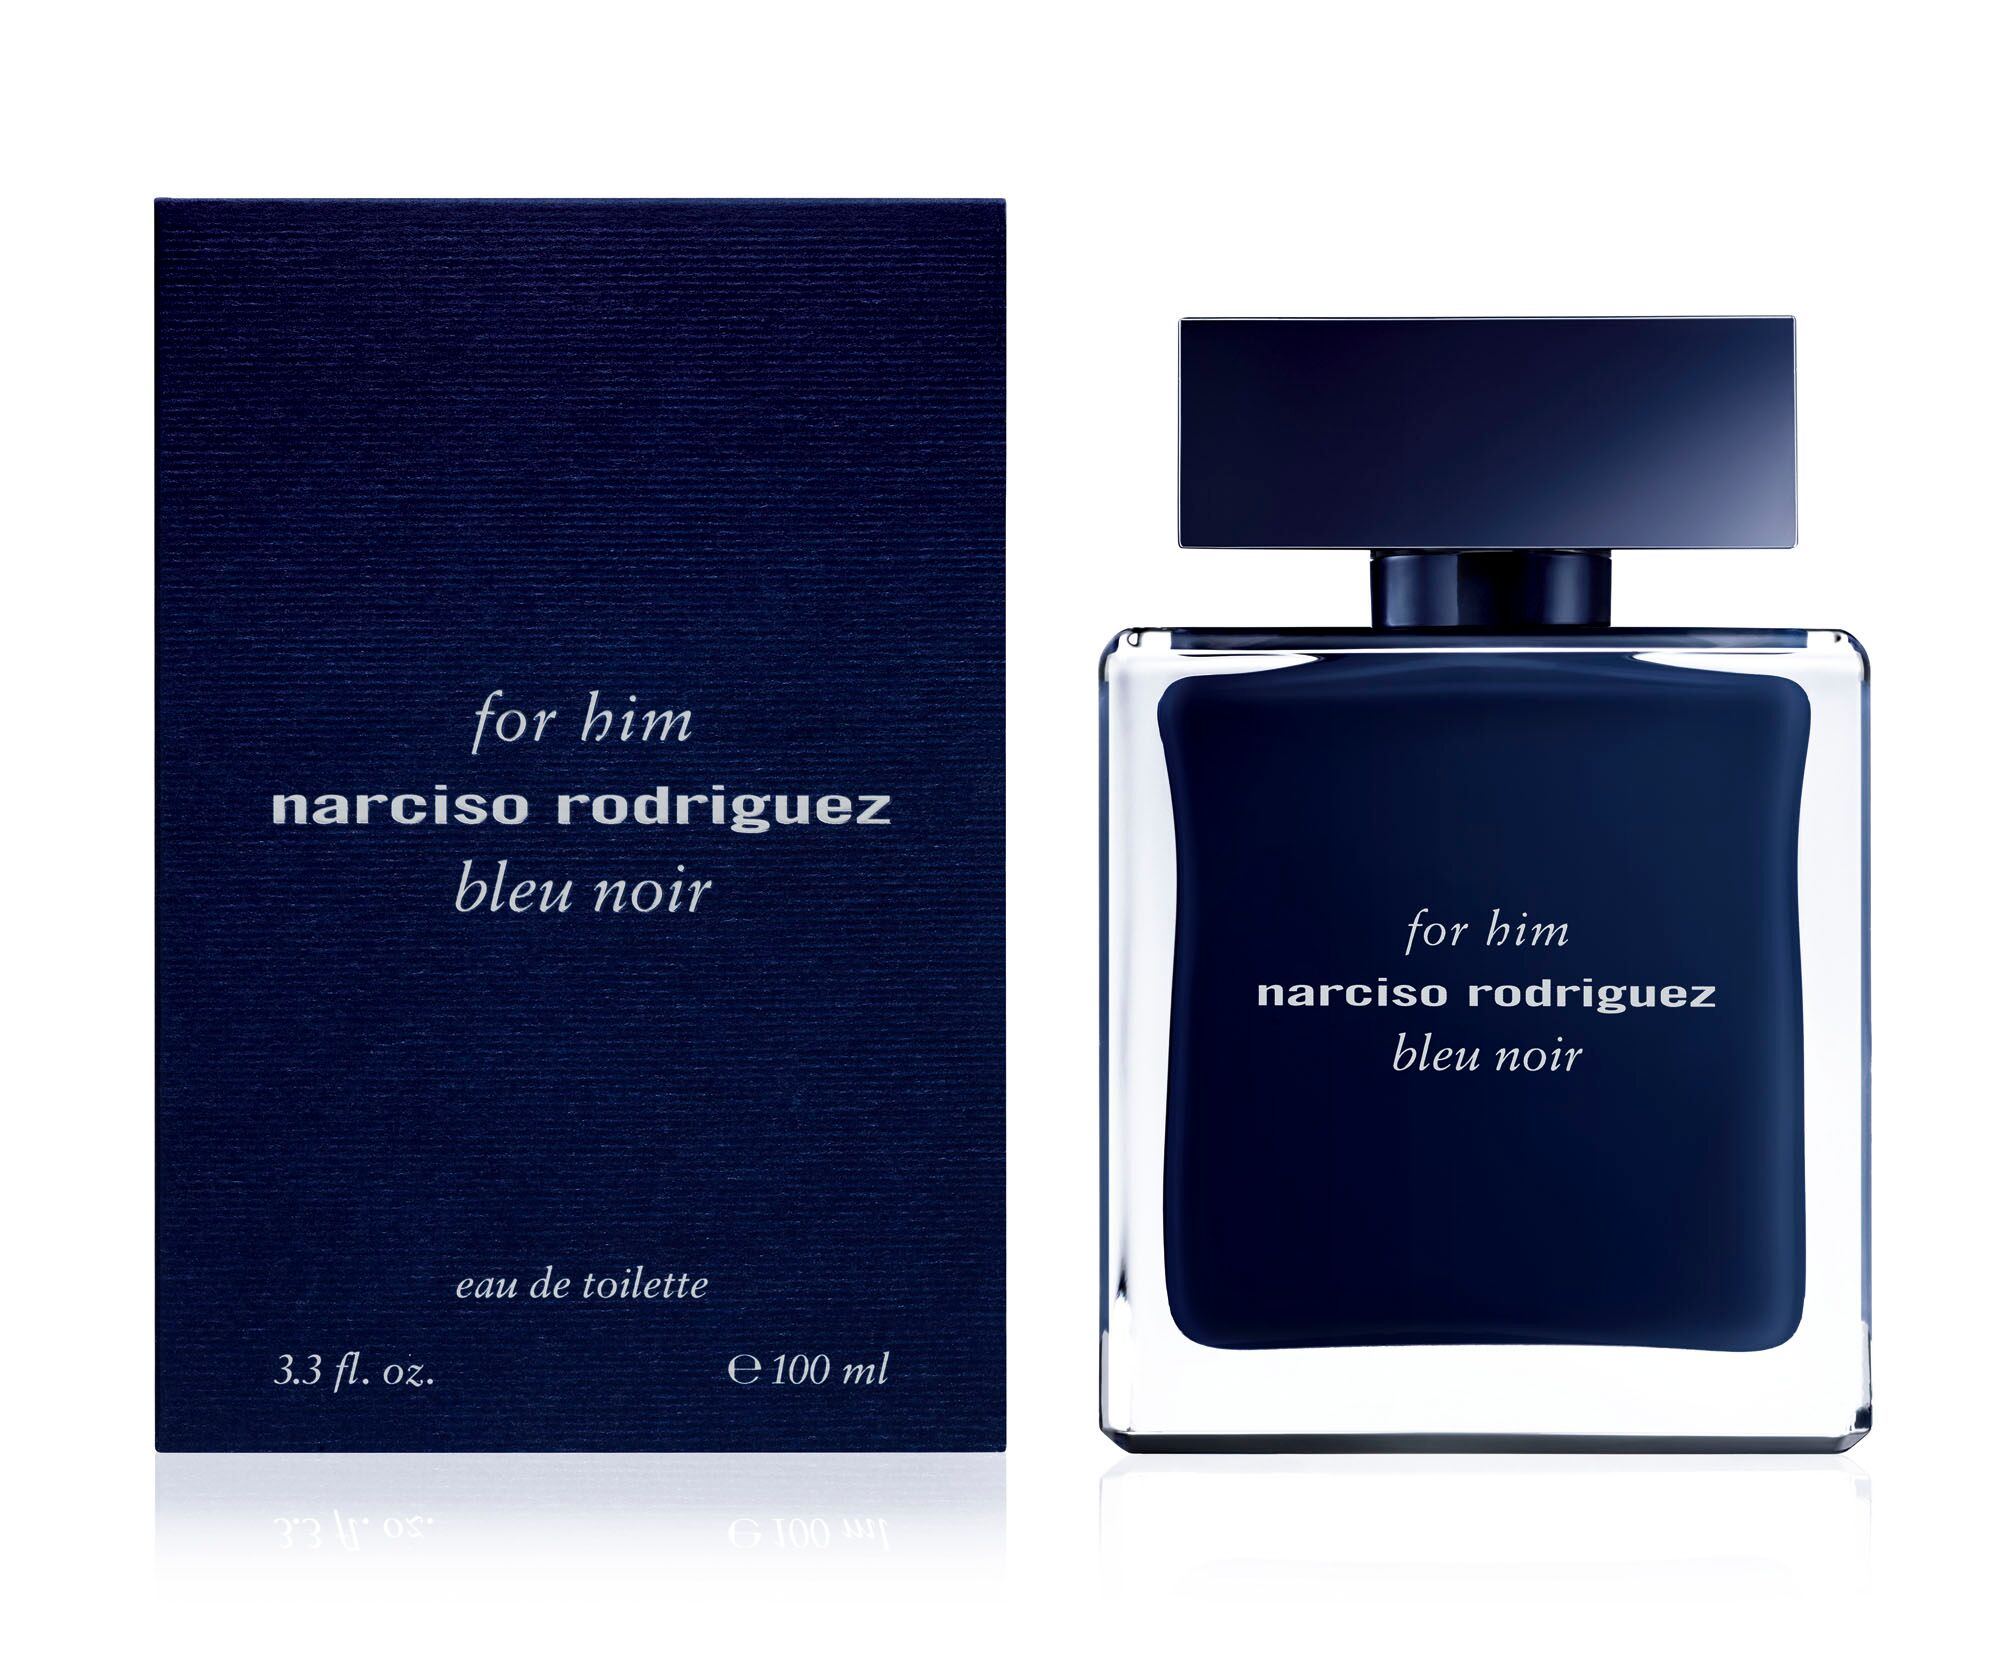 Narciso Rodriguez Bleu Noir For Him EDT, 100 ml